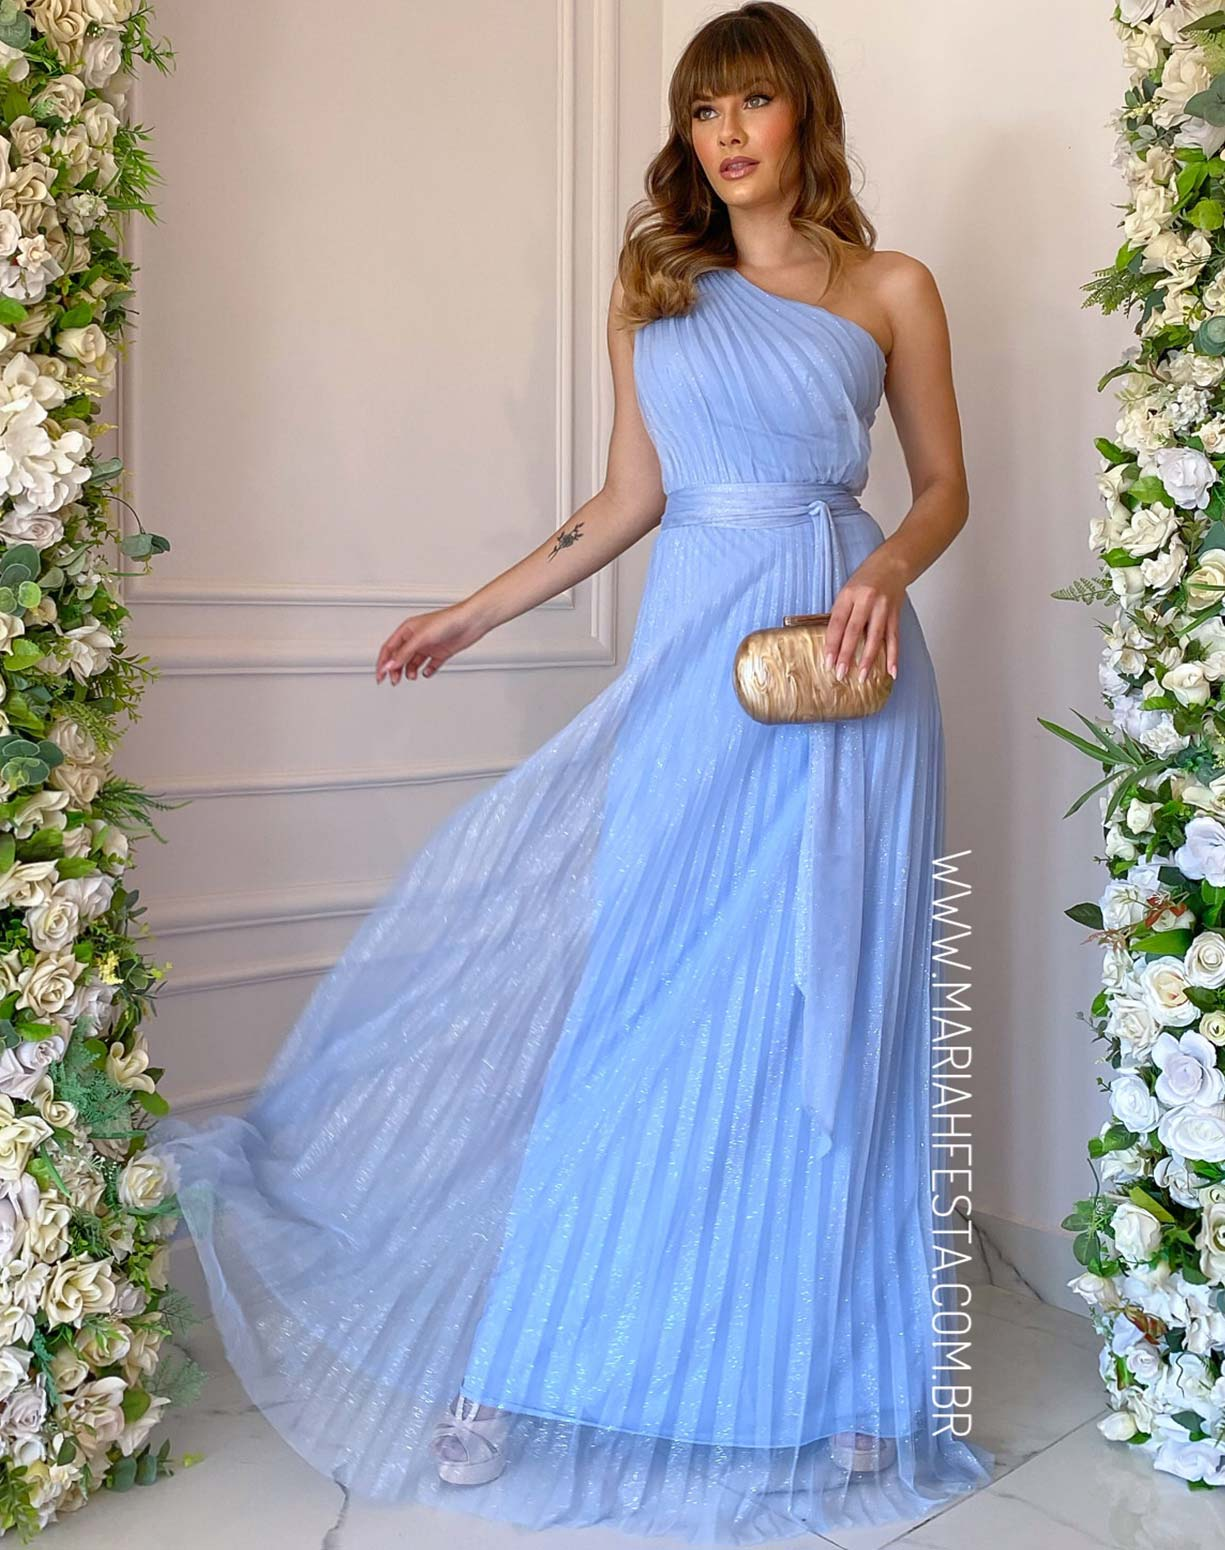 Vestido Azul Serenity Plissado de um Ombro Só